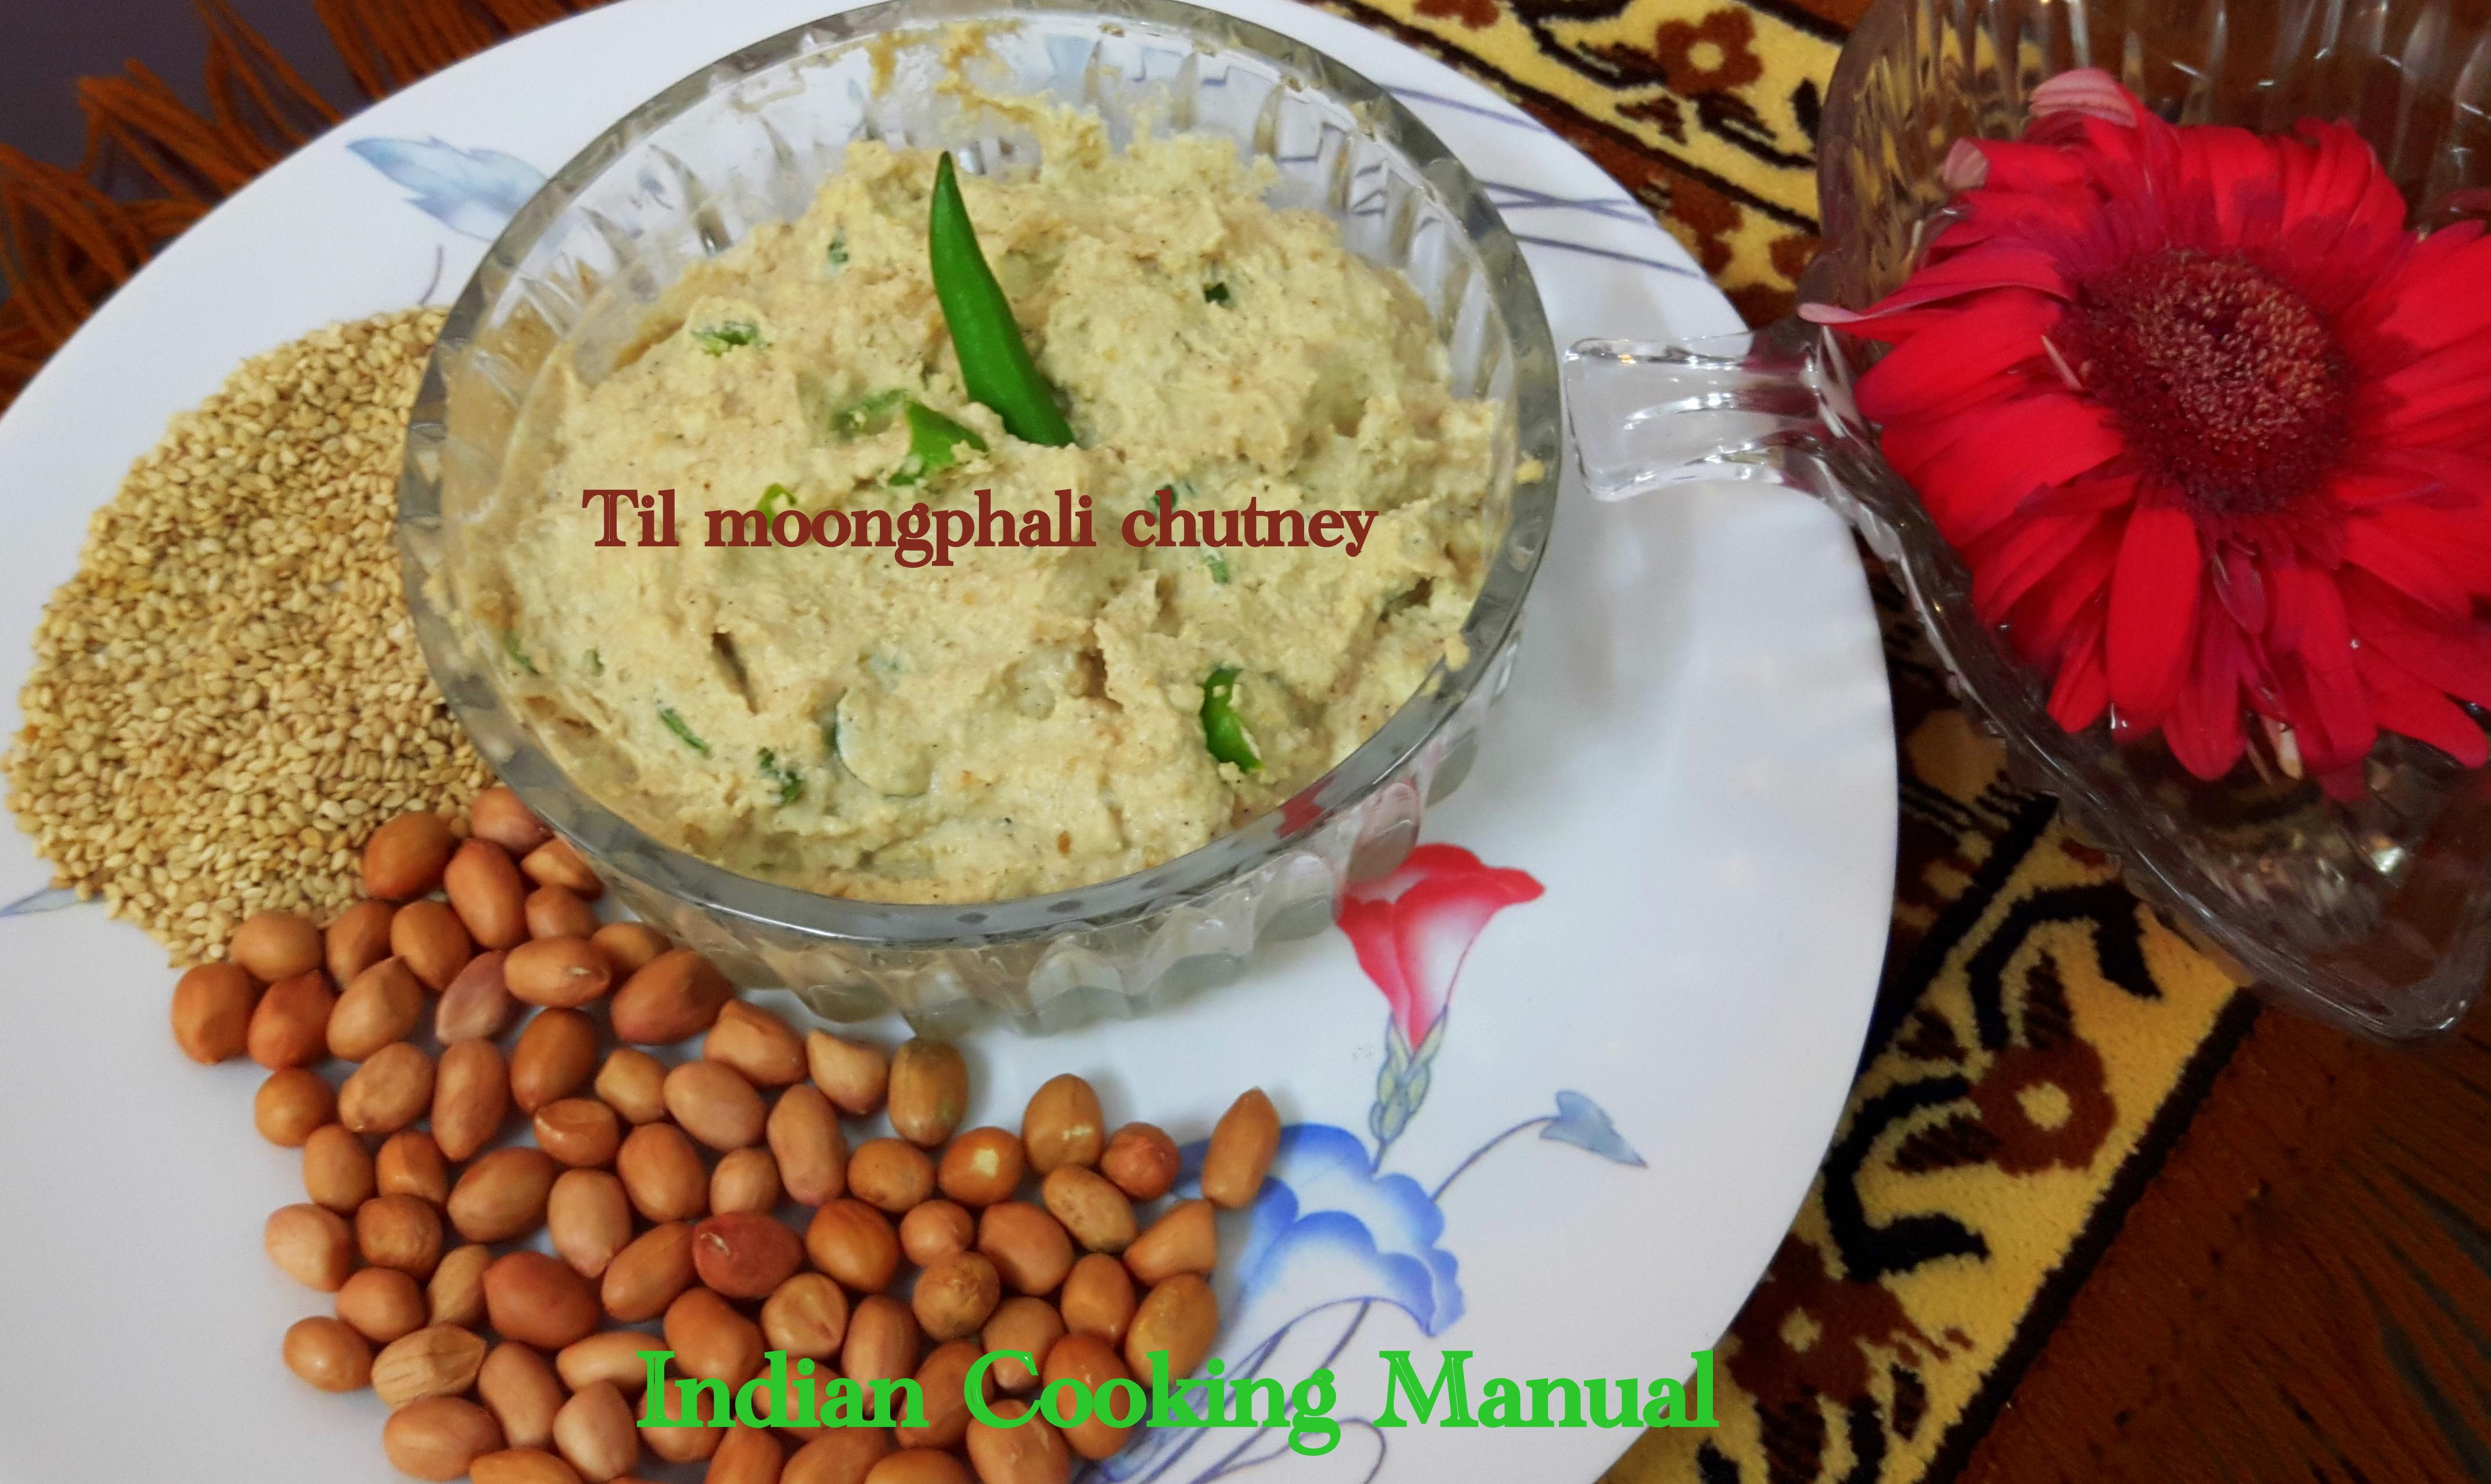 Til and moongphali chutney (peanut and sesame seed dip)